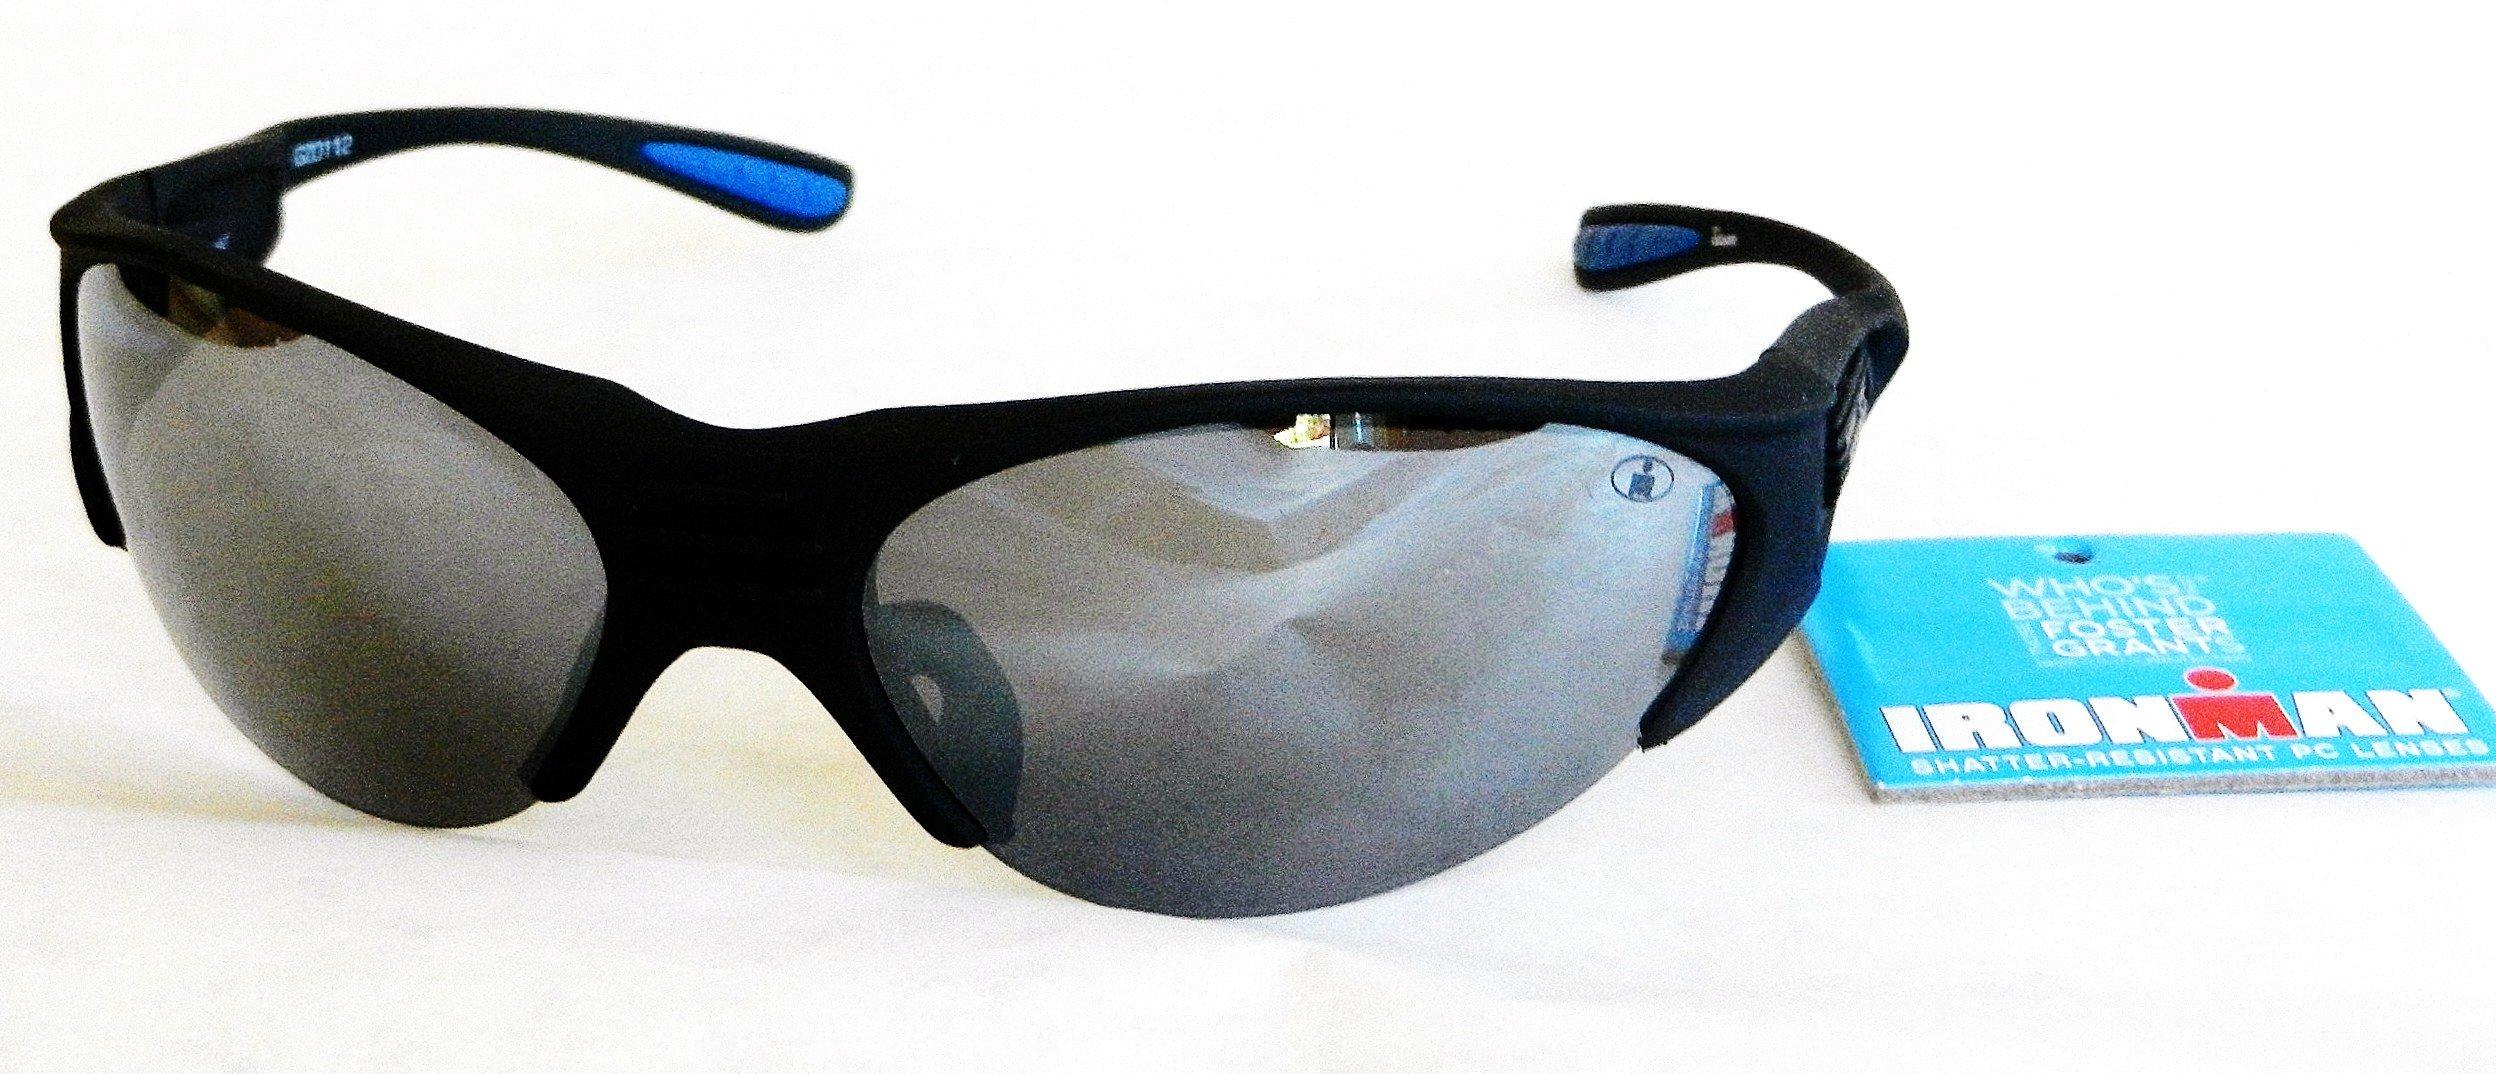 b5c2dc5a9b Foster Grant Iron Man Empower Sunglasses (1037) 100% UVA   UVB Protection-